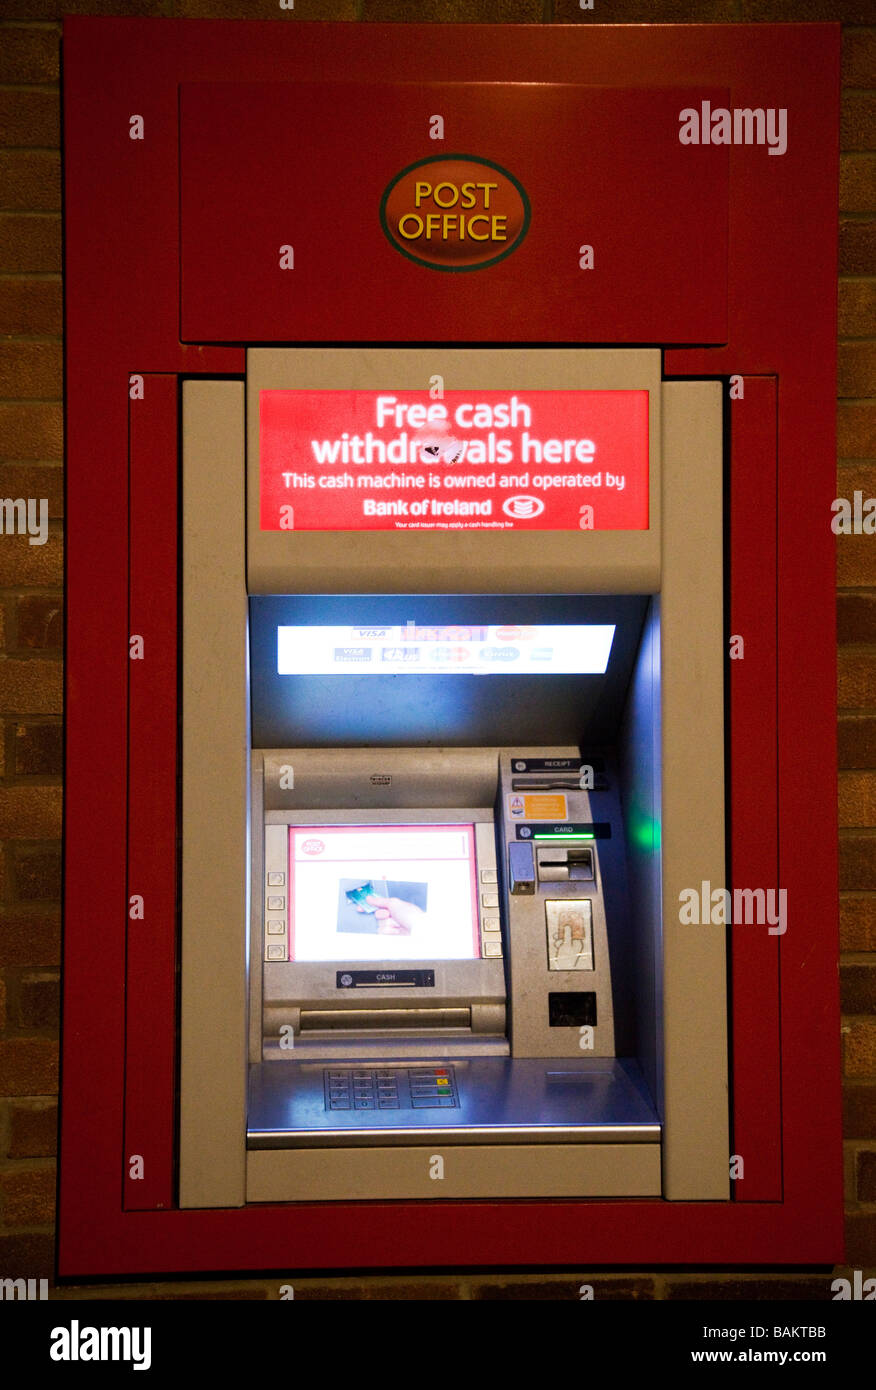 Post Office ATM cash machine in UK Stock Photo - Alamy